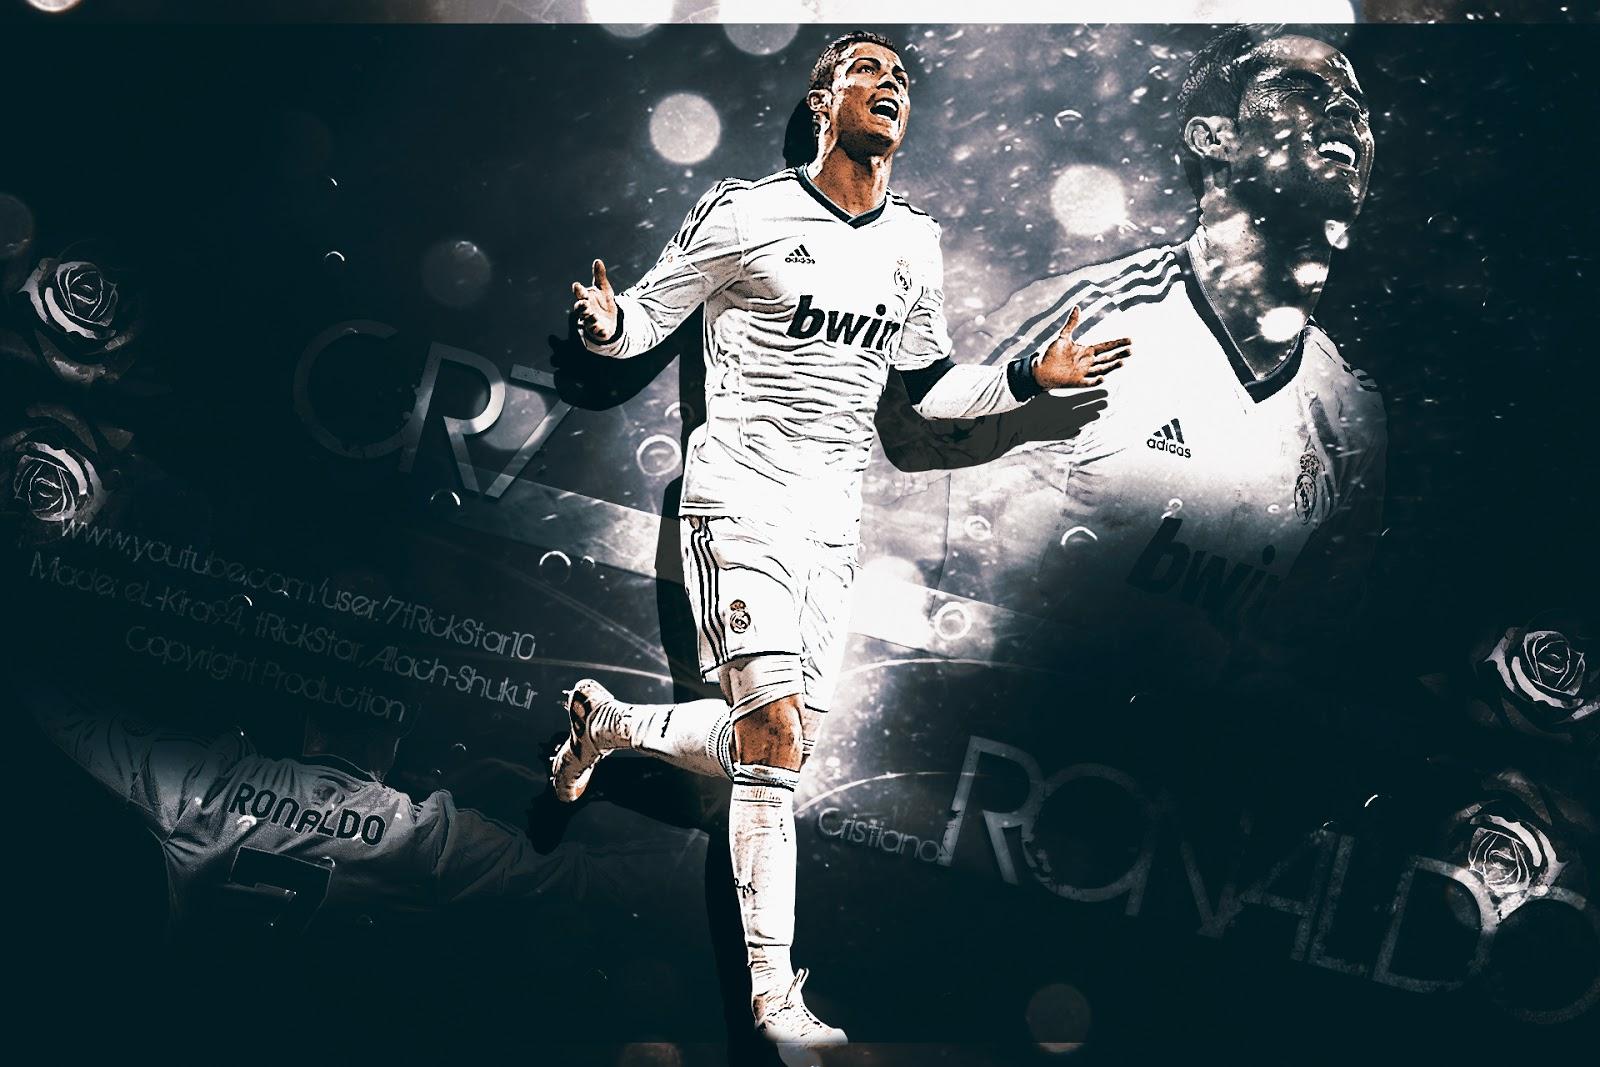 Cristiano Ronaldo New HD Wallpapers 2014 2015 Football Wallpapers HD 1600x1067